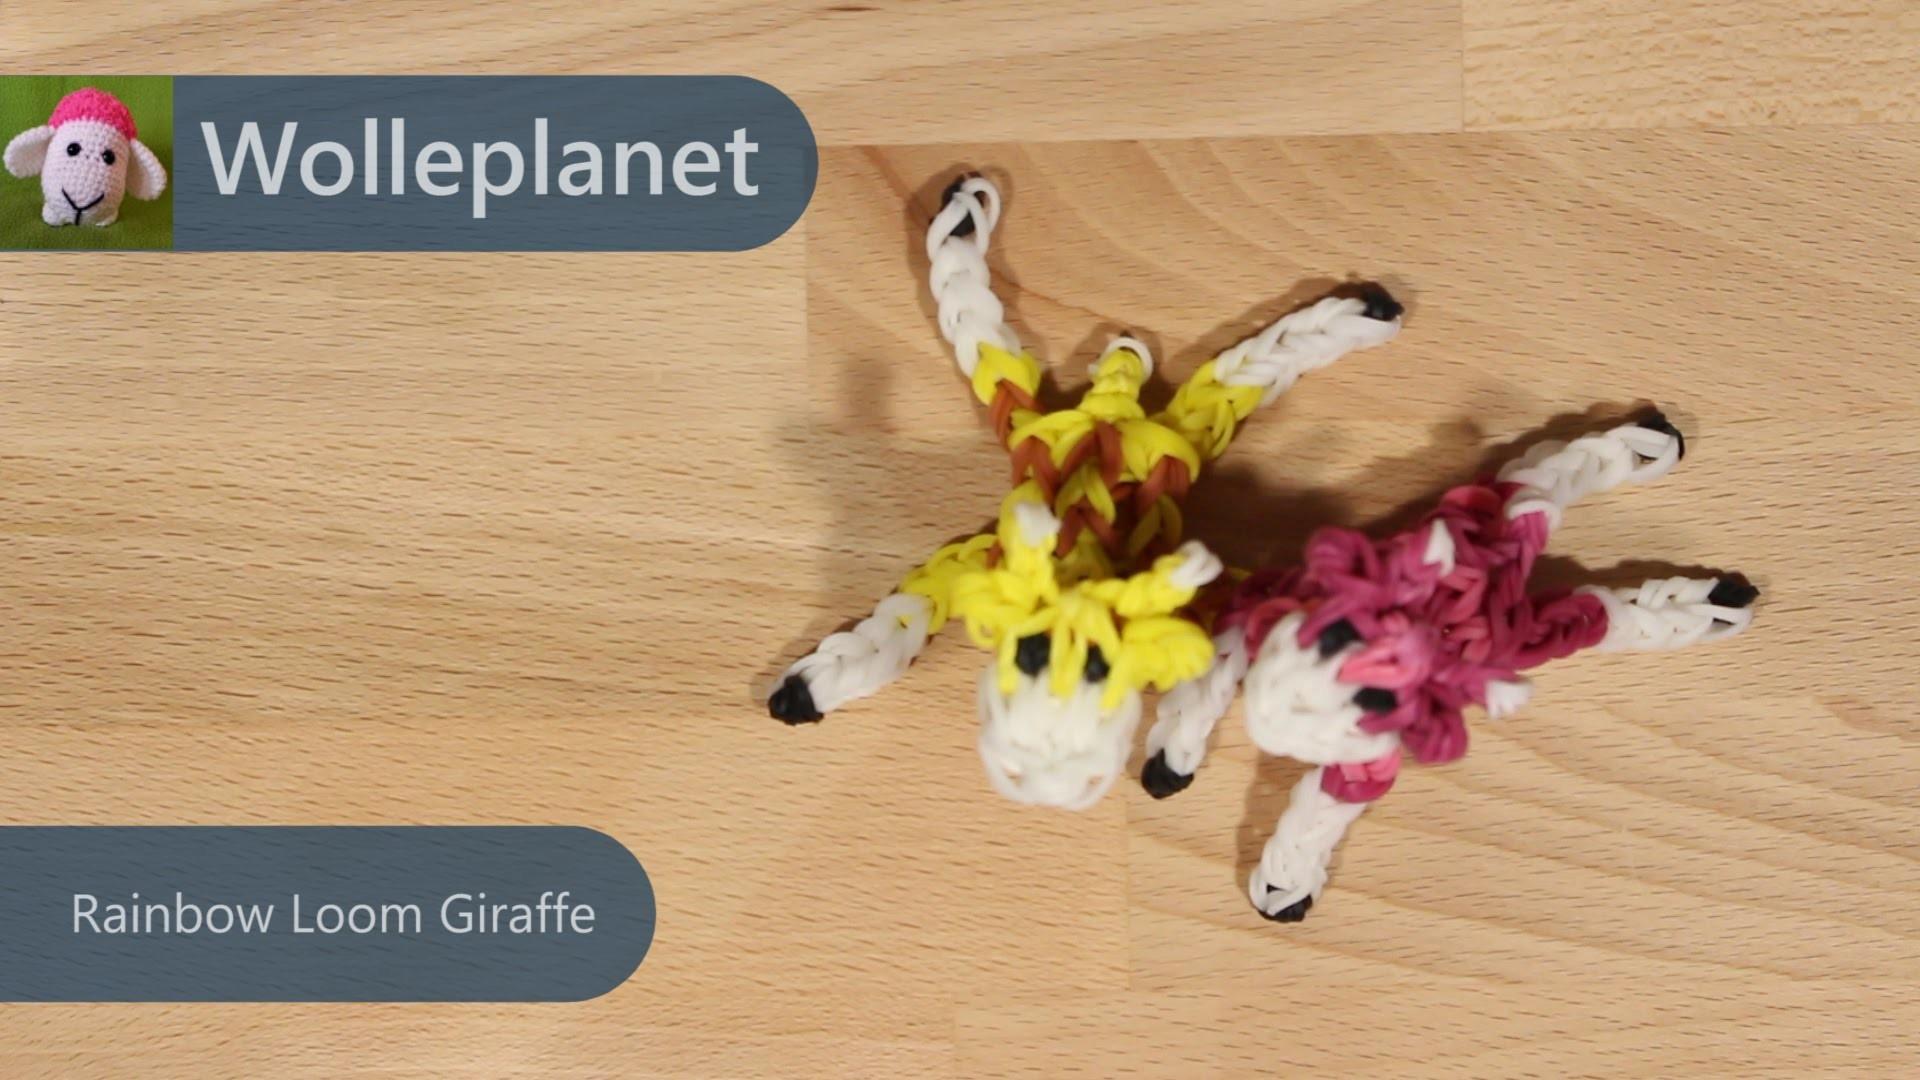 Rainbow Loom Giraffe